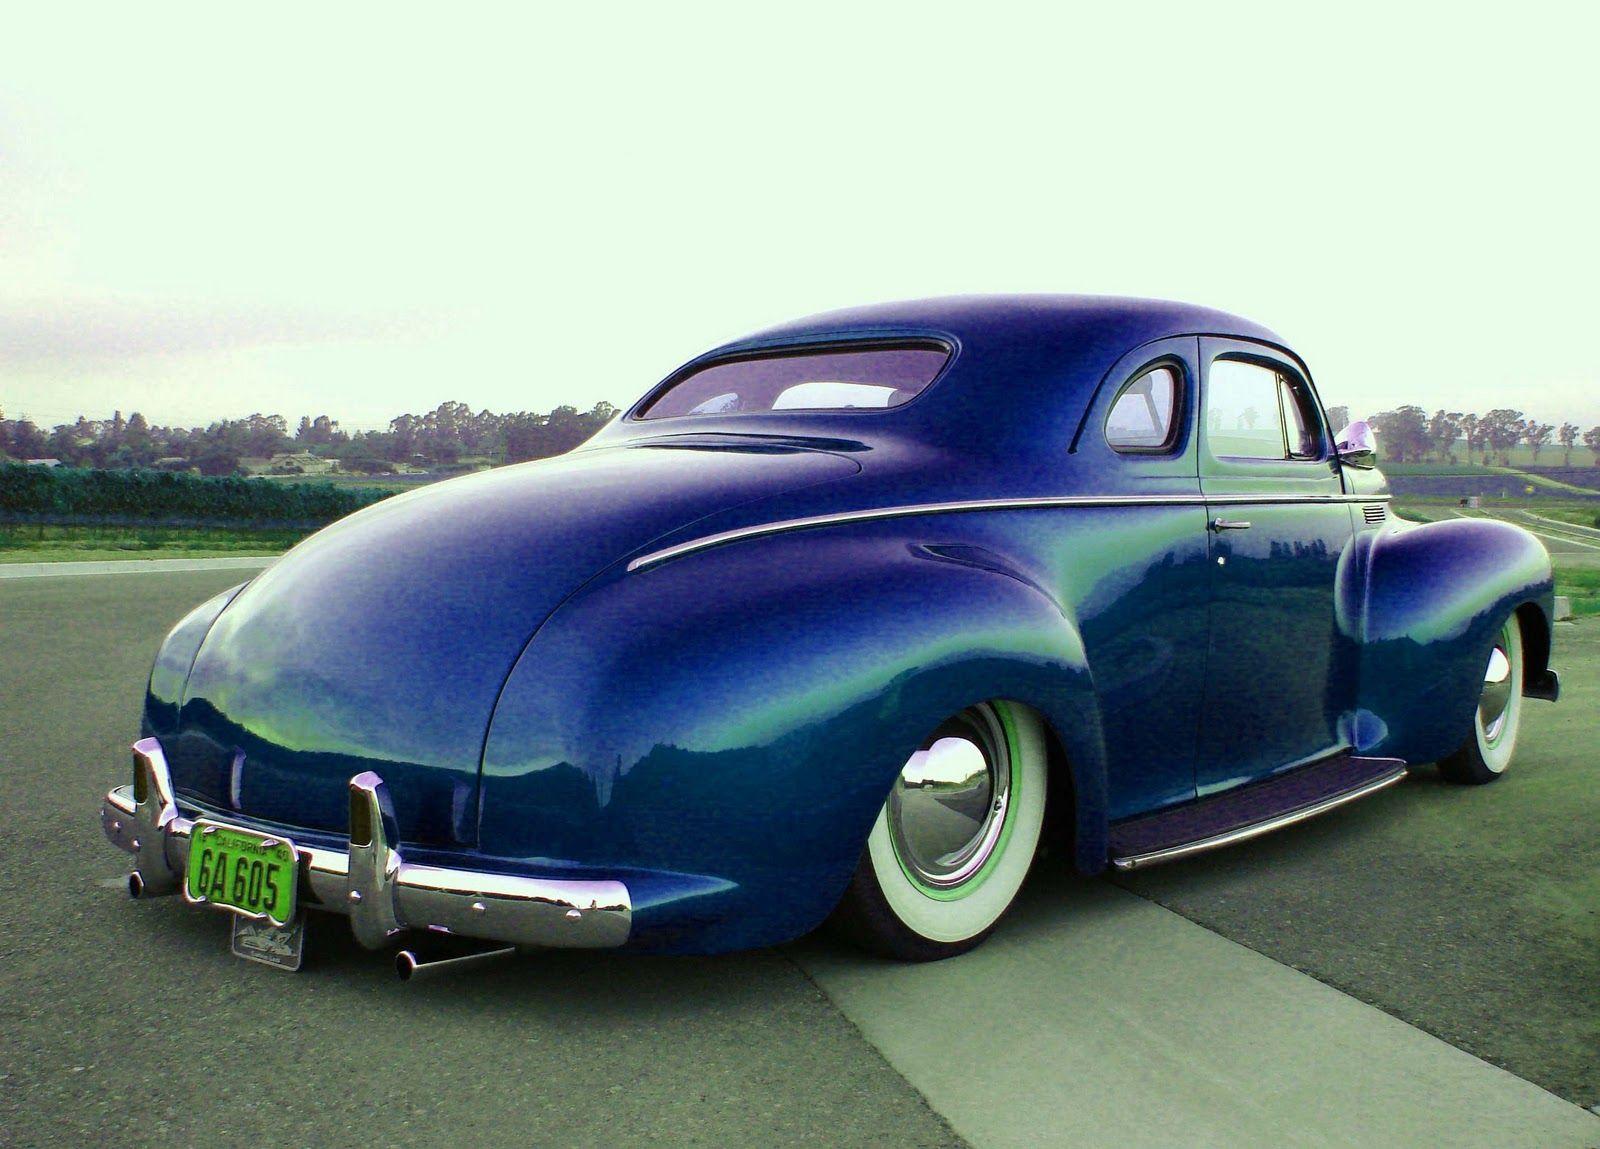 1940 Chrysler - cool color combo | Modes of Transportation ...